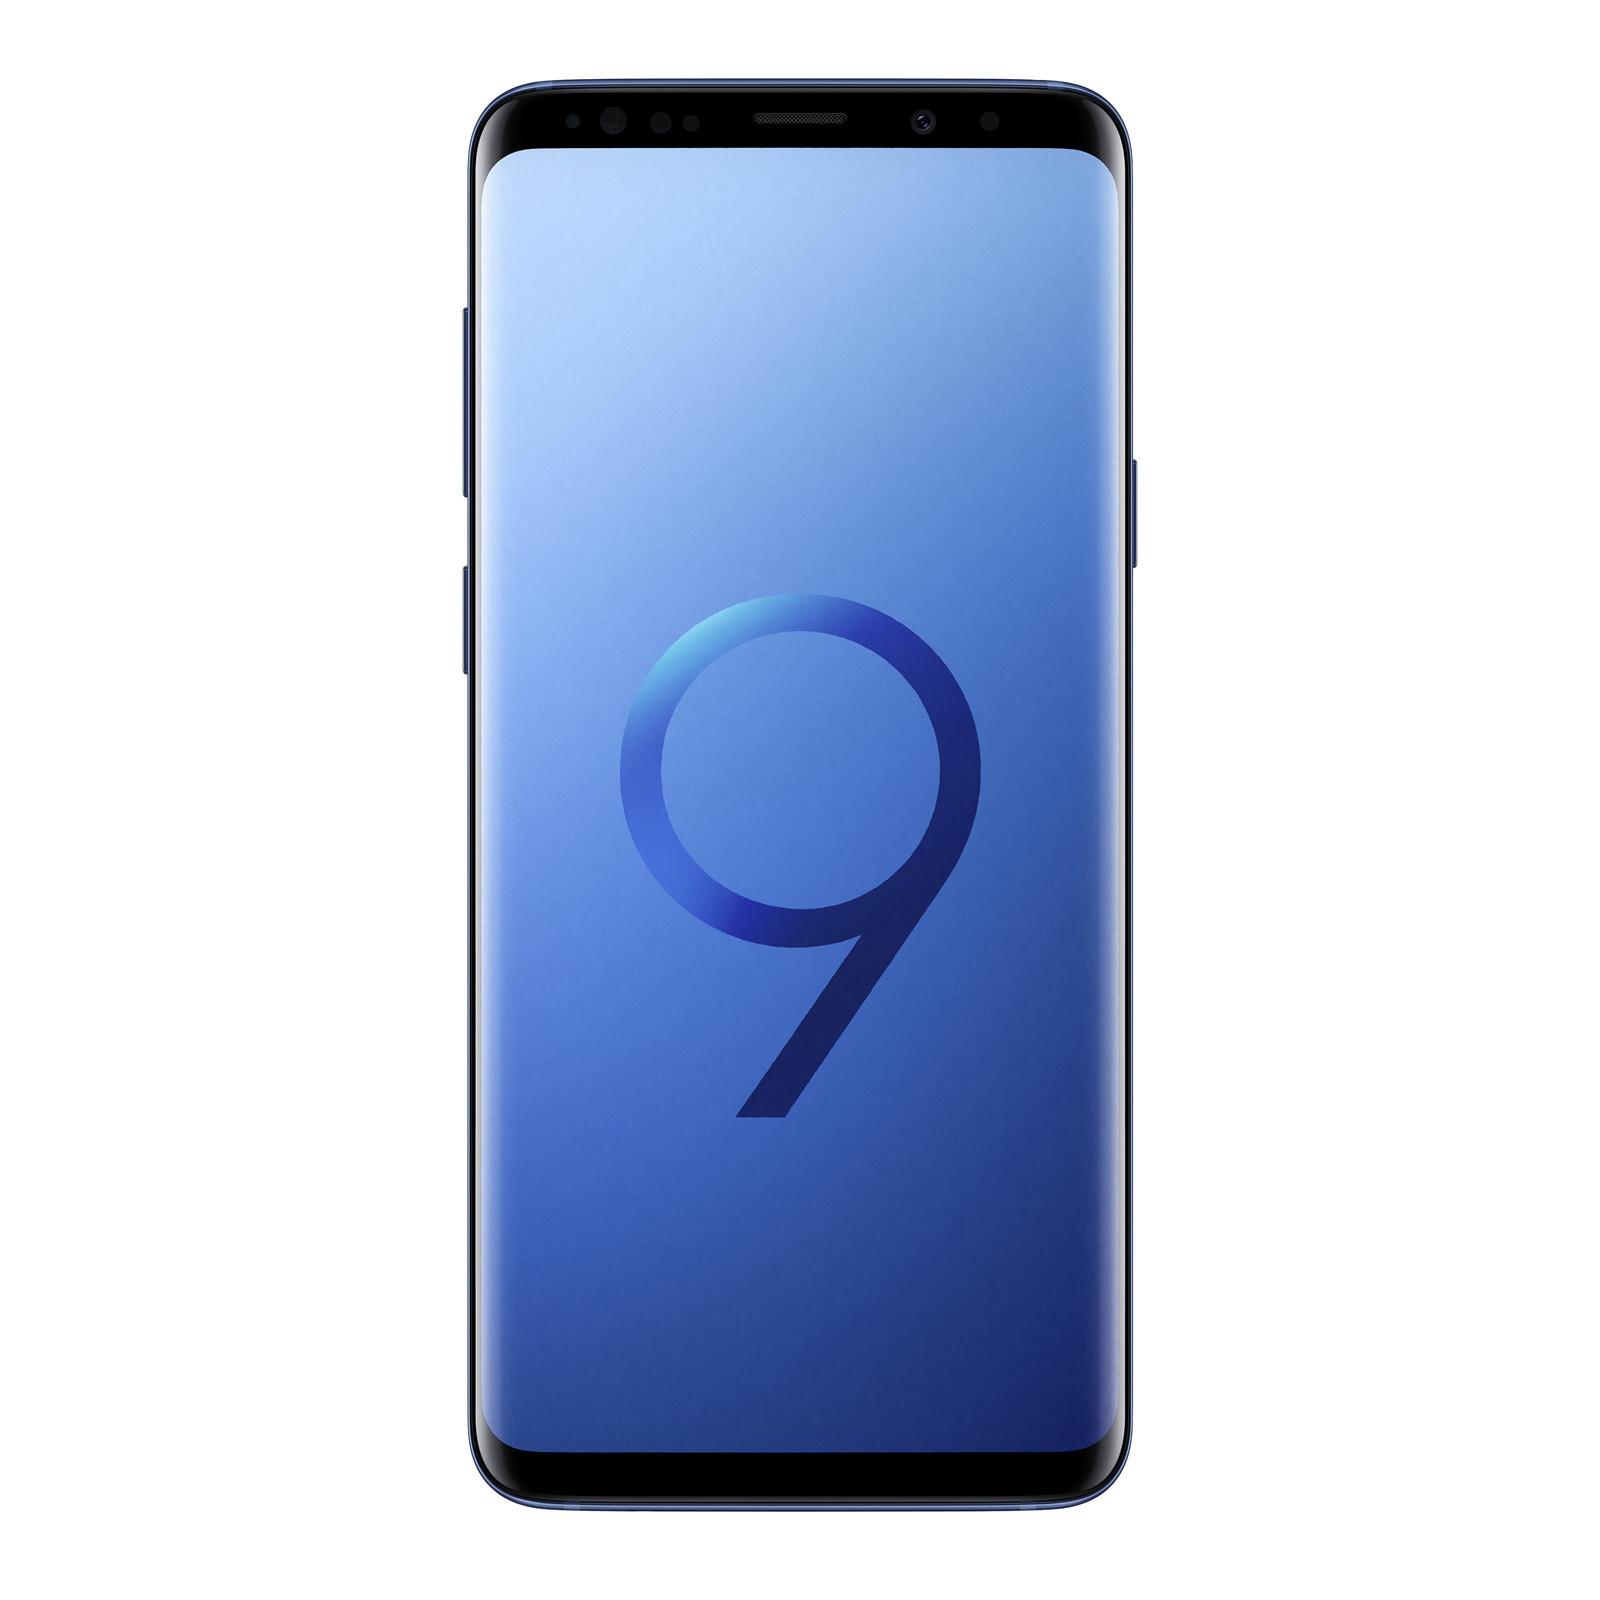 Samsung Galaxy S9+ SM-G965F Smartphone 64GB Coral image